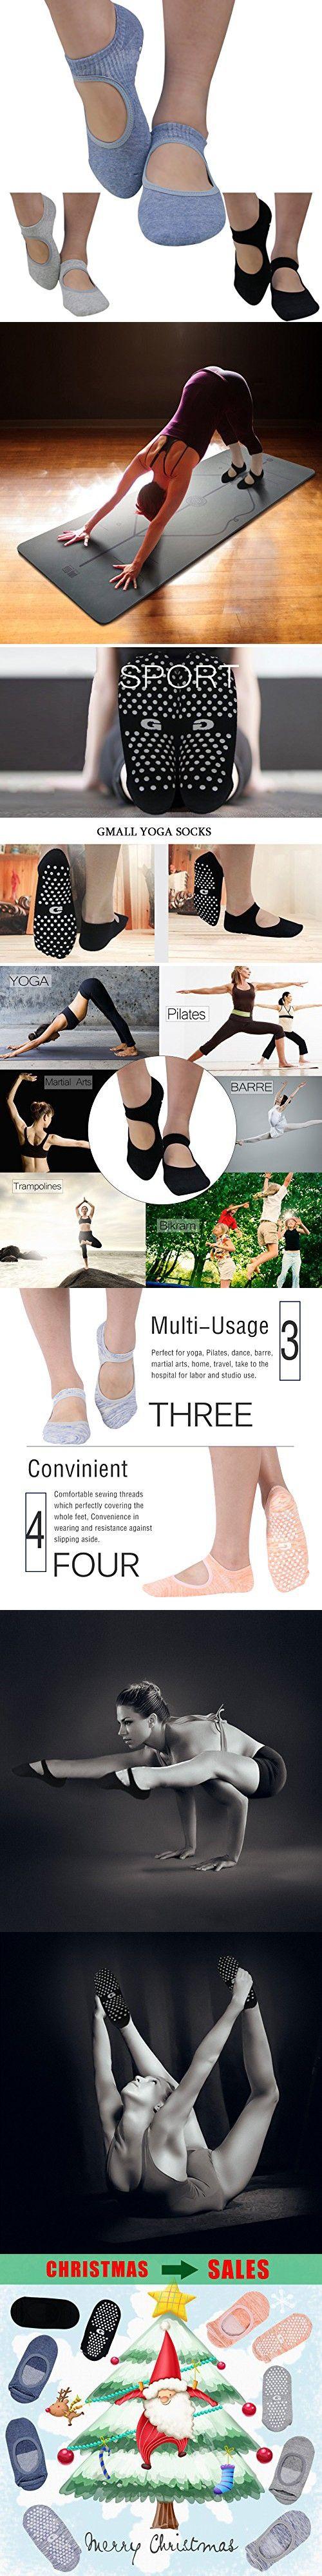 Low Cut Socks, Yoga Pilates Socks Non Slip Skid Barre Sock with Grips for Women Gmall 3 Pairs